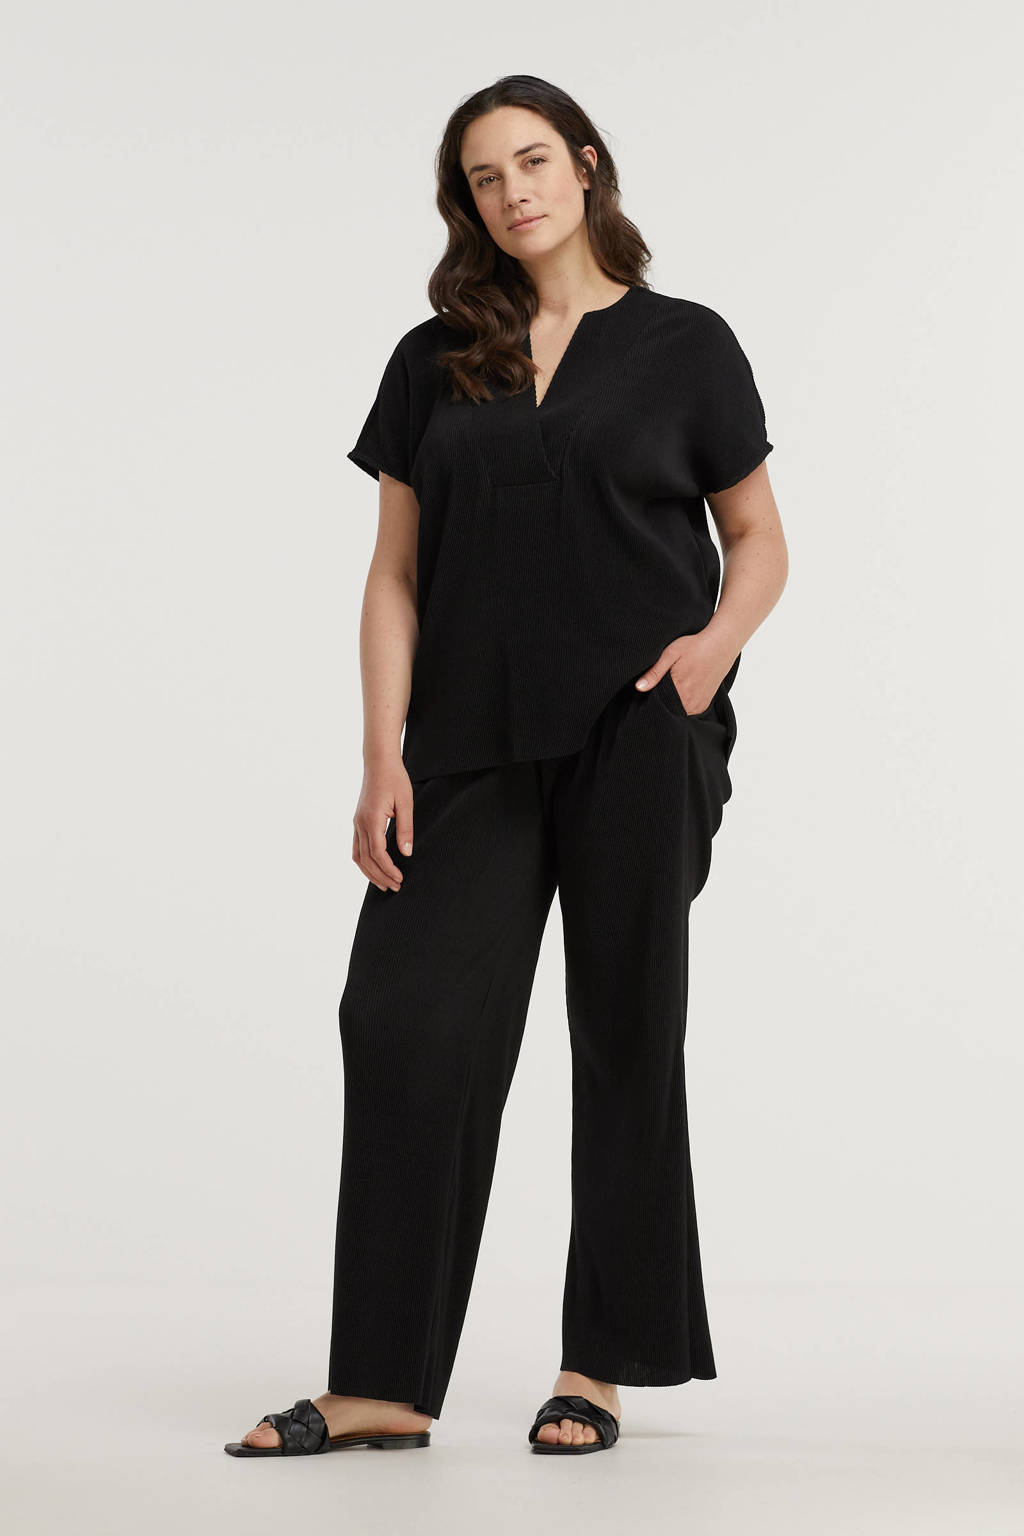 GREAT LOOKS plissé broek zwart, Zwart